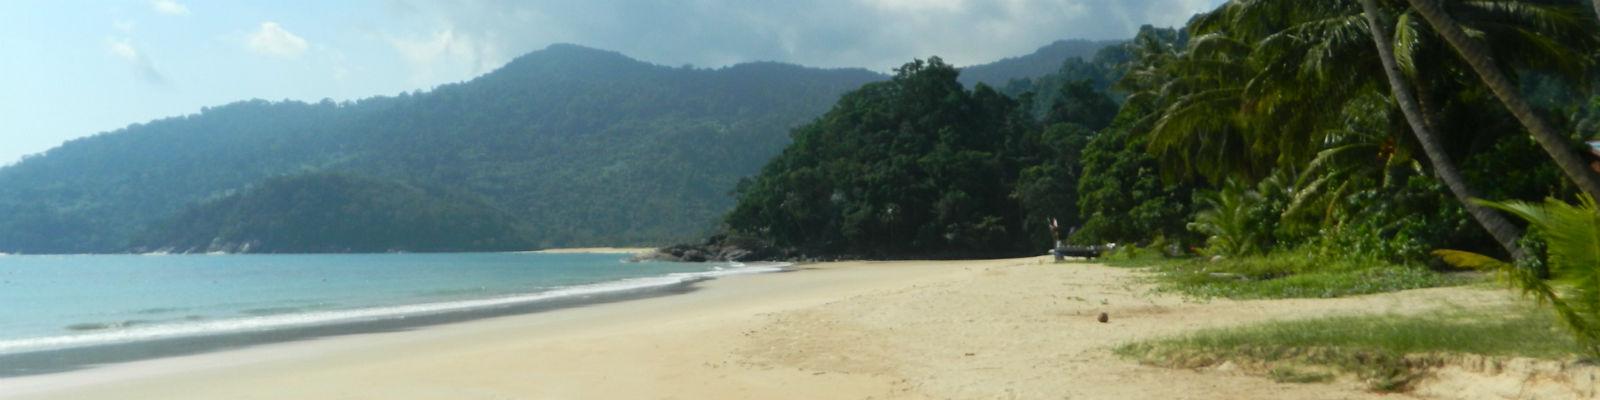 Juara Beach, Tioman Island, Pahang State